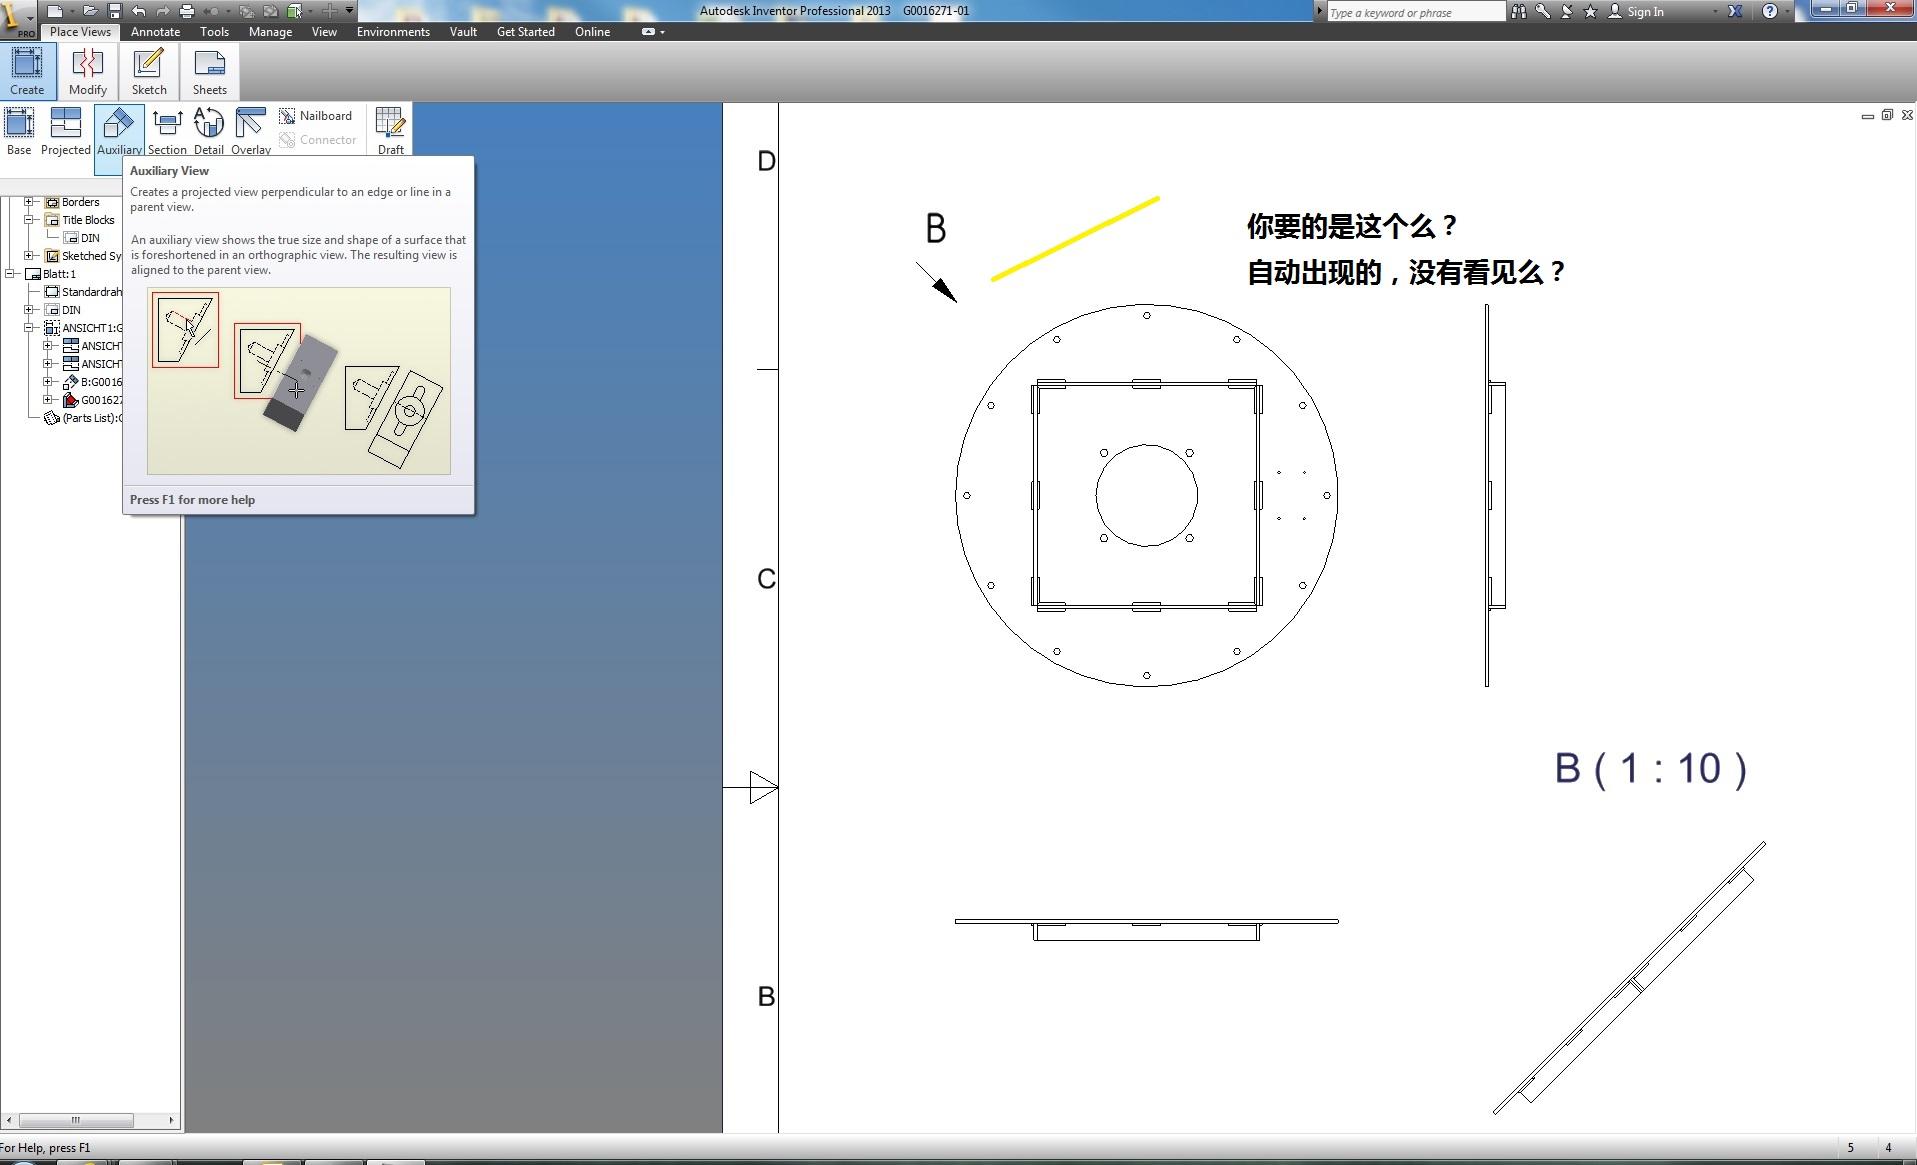 CAD软件技术v穹顶交流区inventor穹顶图表达问洋葱头工程cad图纸图片